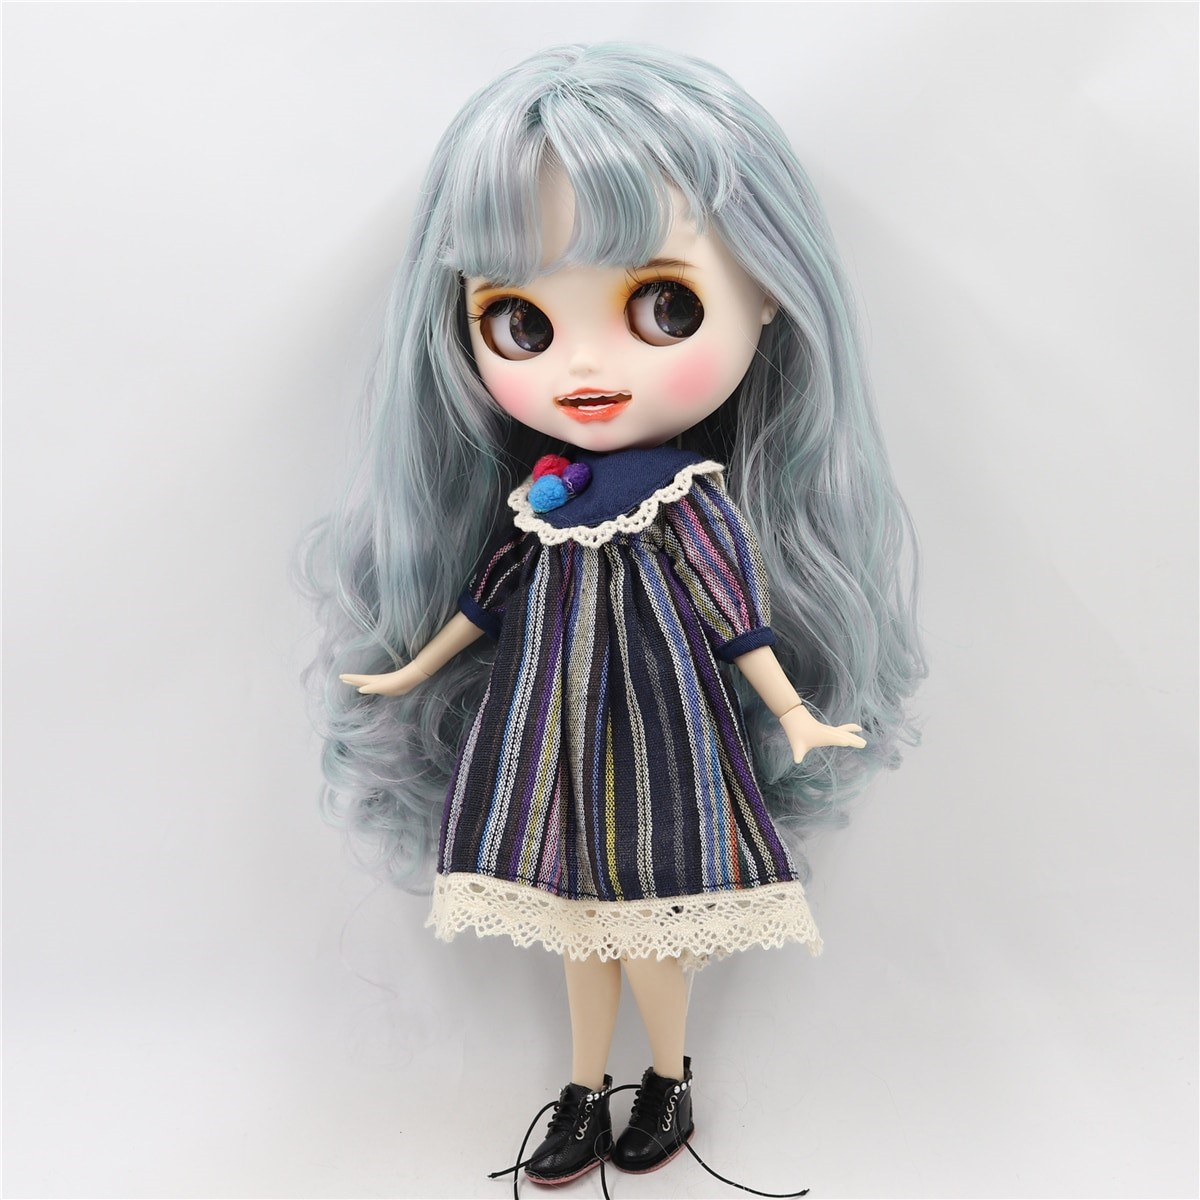 Loretta - Premium Custom Blythe Doll with Clothes Smiling Face Premium Blythe Dolls 🆕 Smiling Face